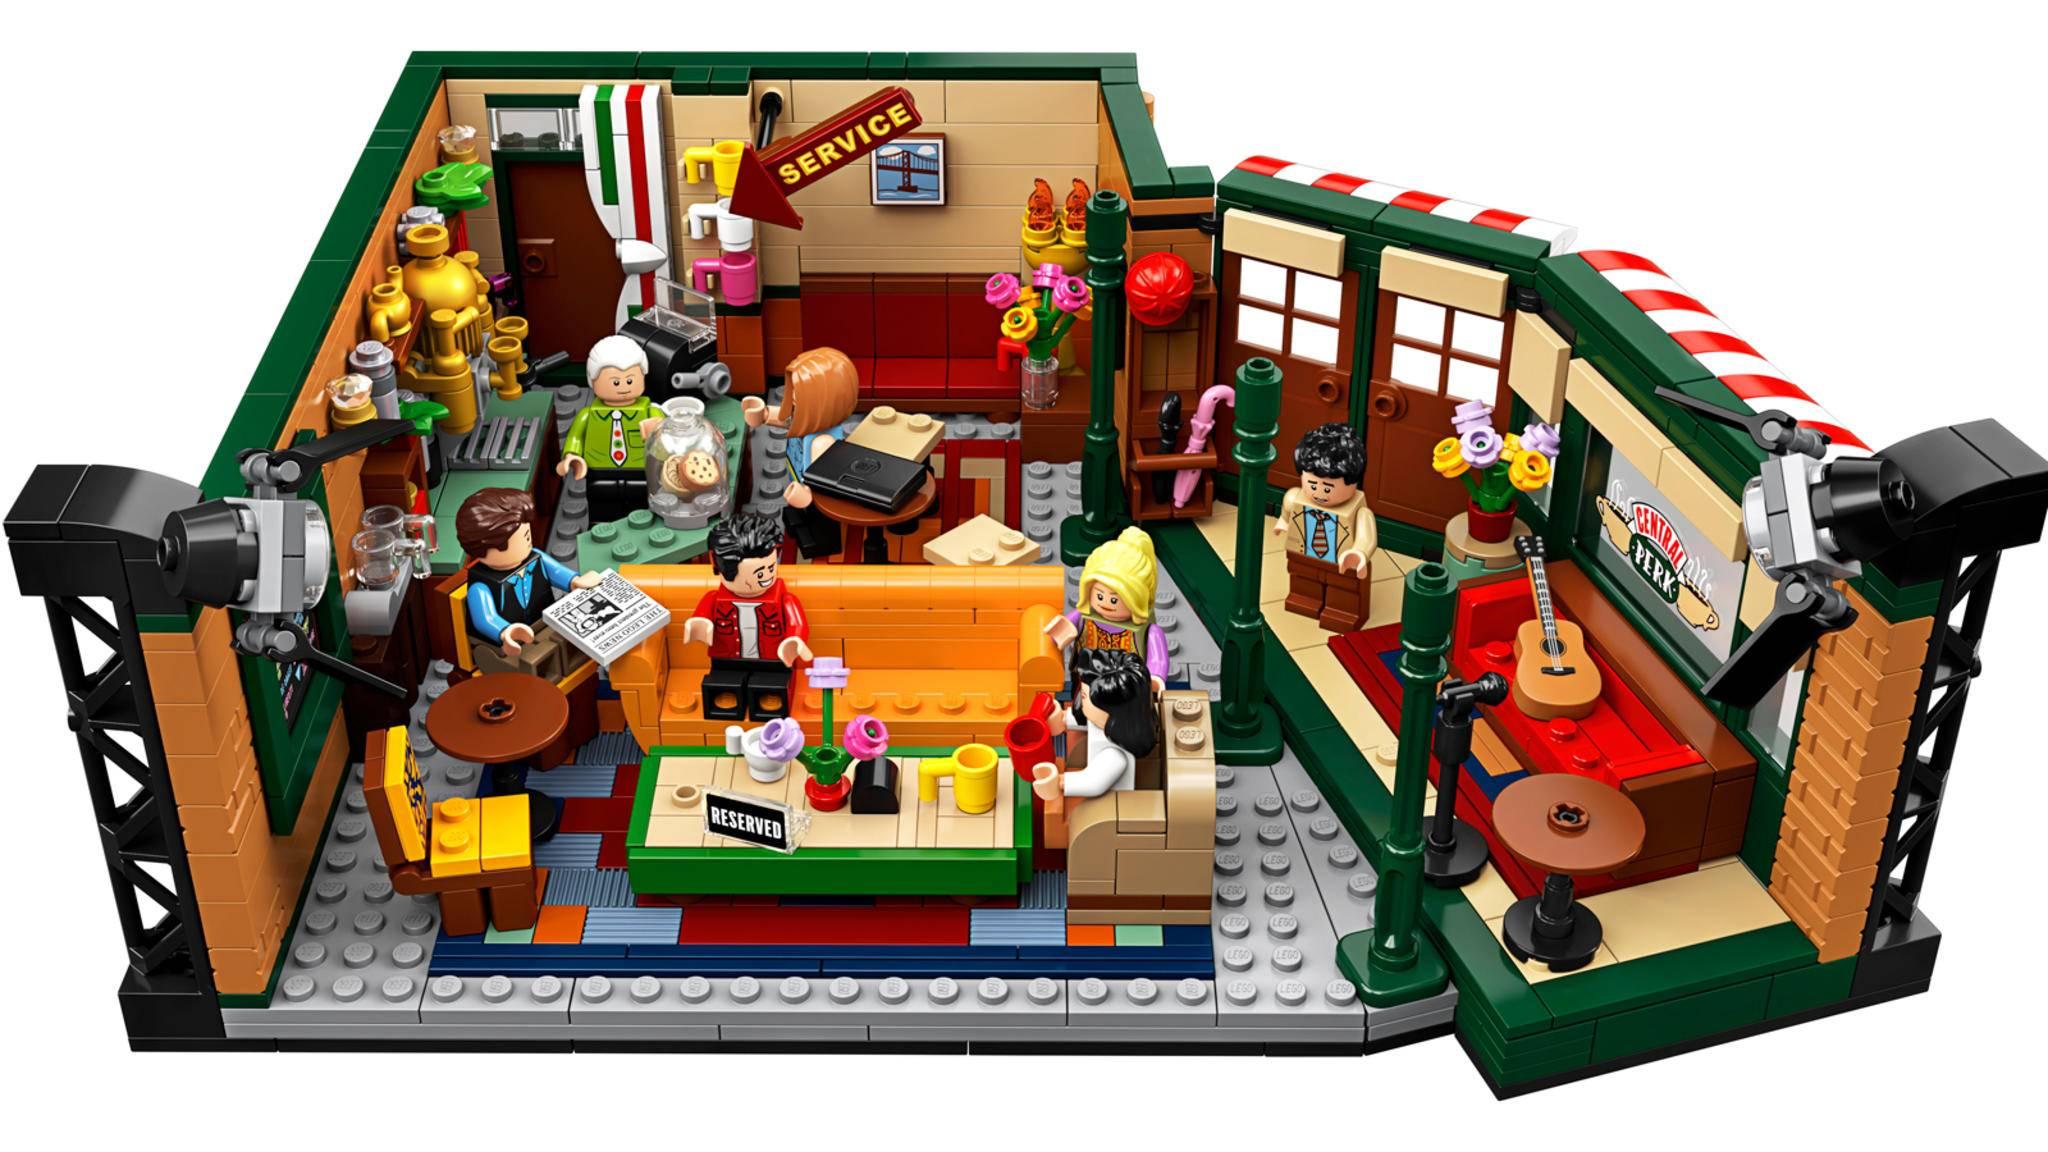 Gesamtansicht des Lego Friends Central Perk Sets